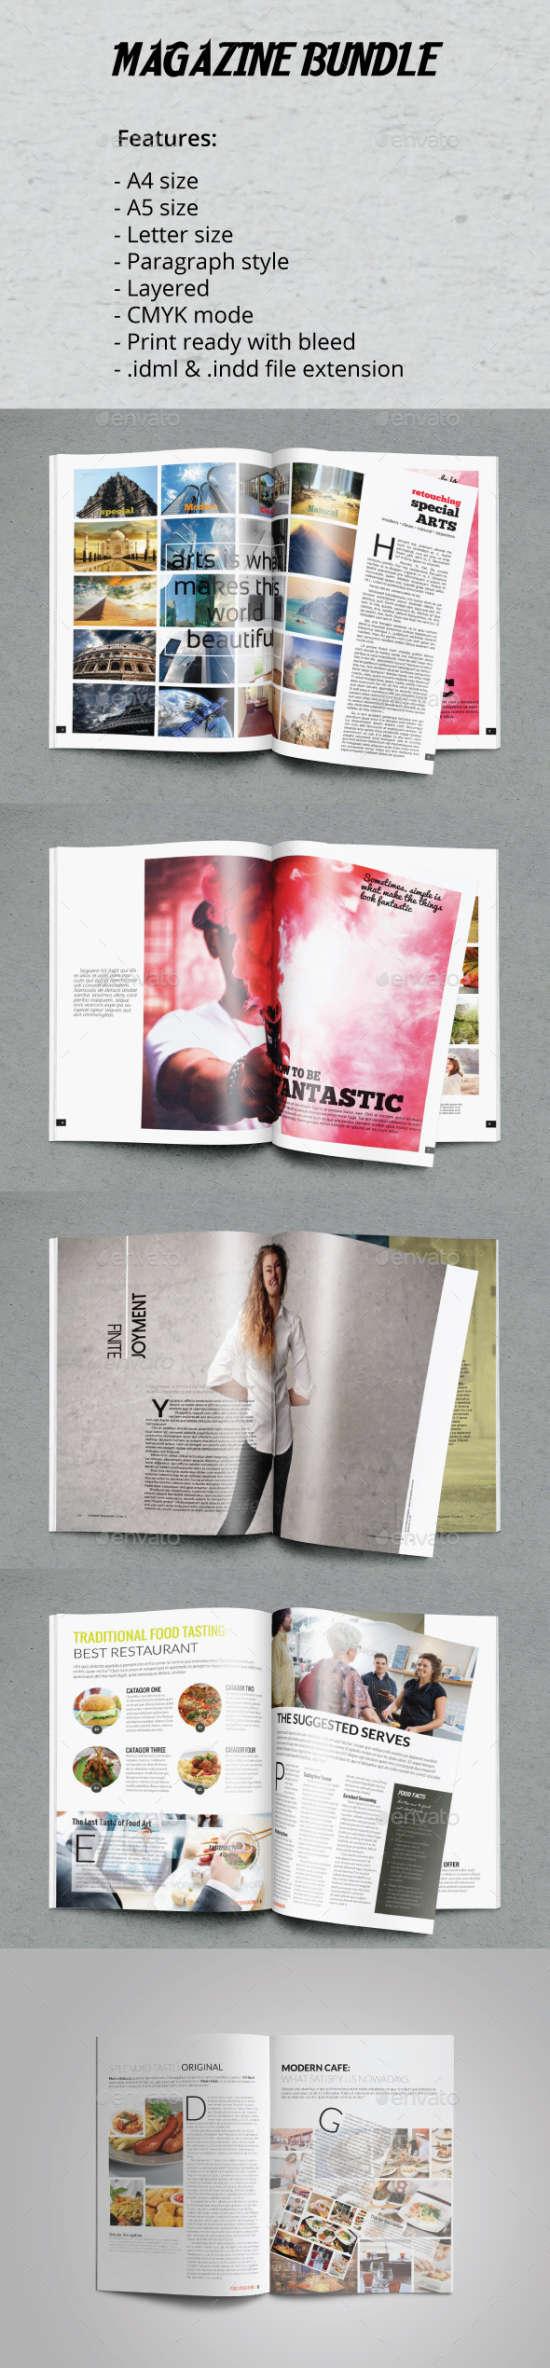 15 Nice InDesign Magazine Templates - XDesigns